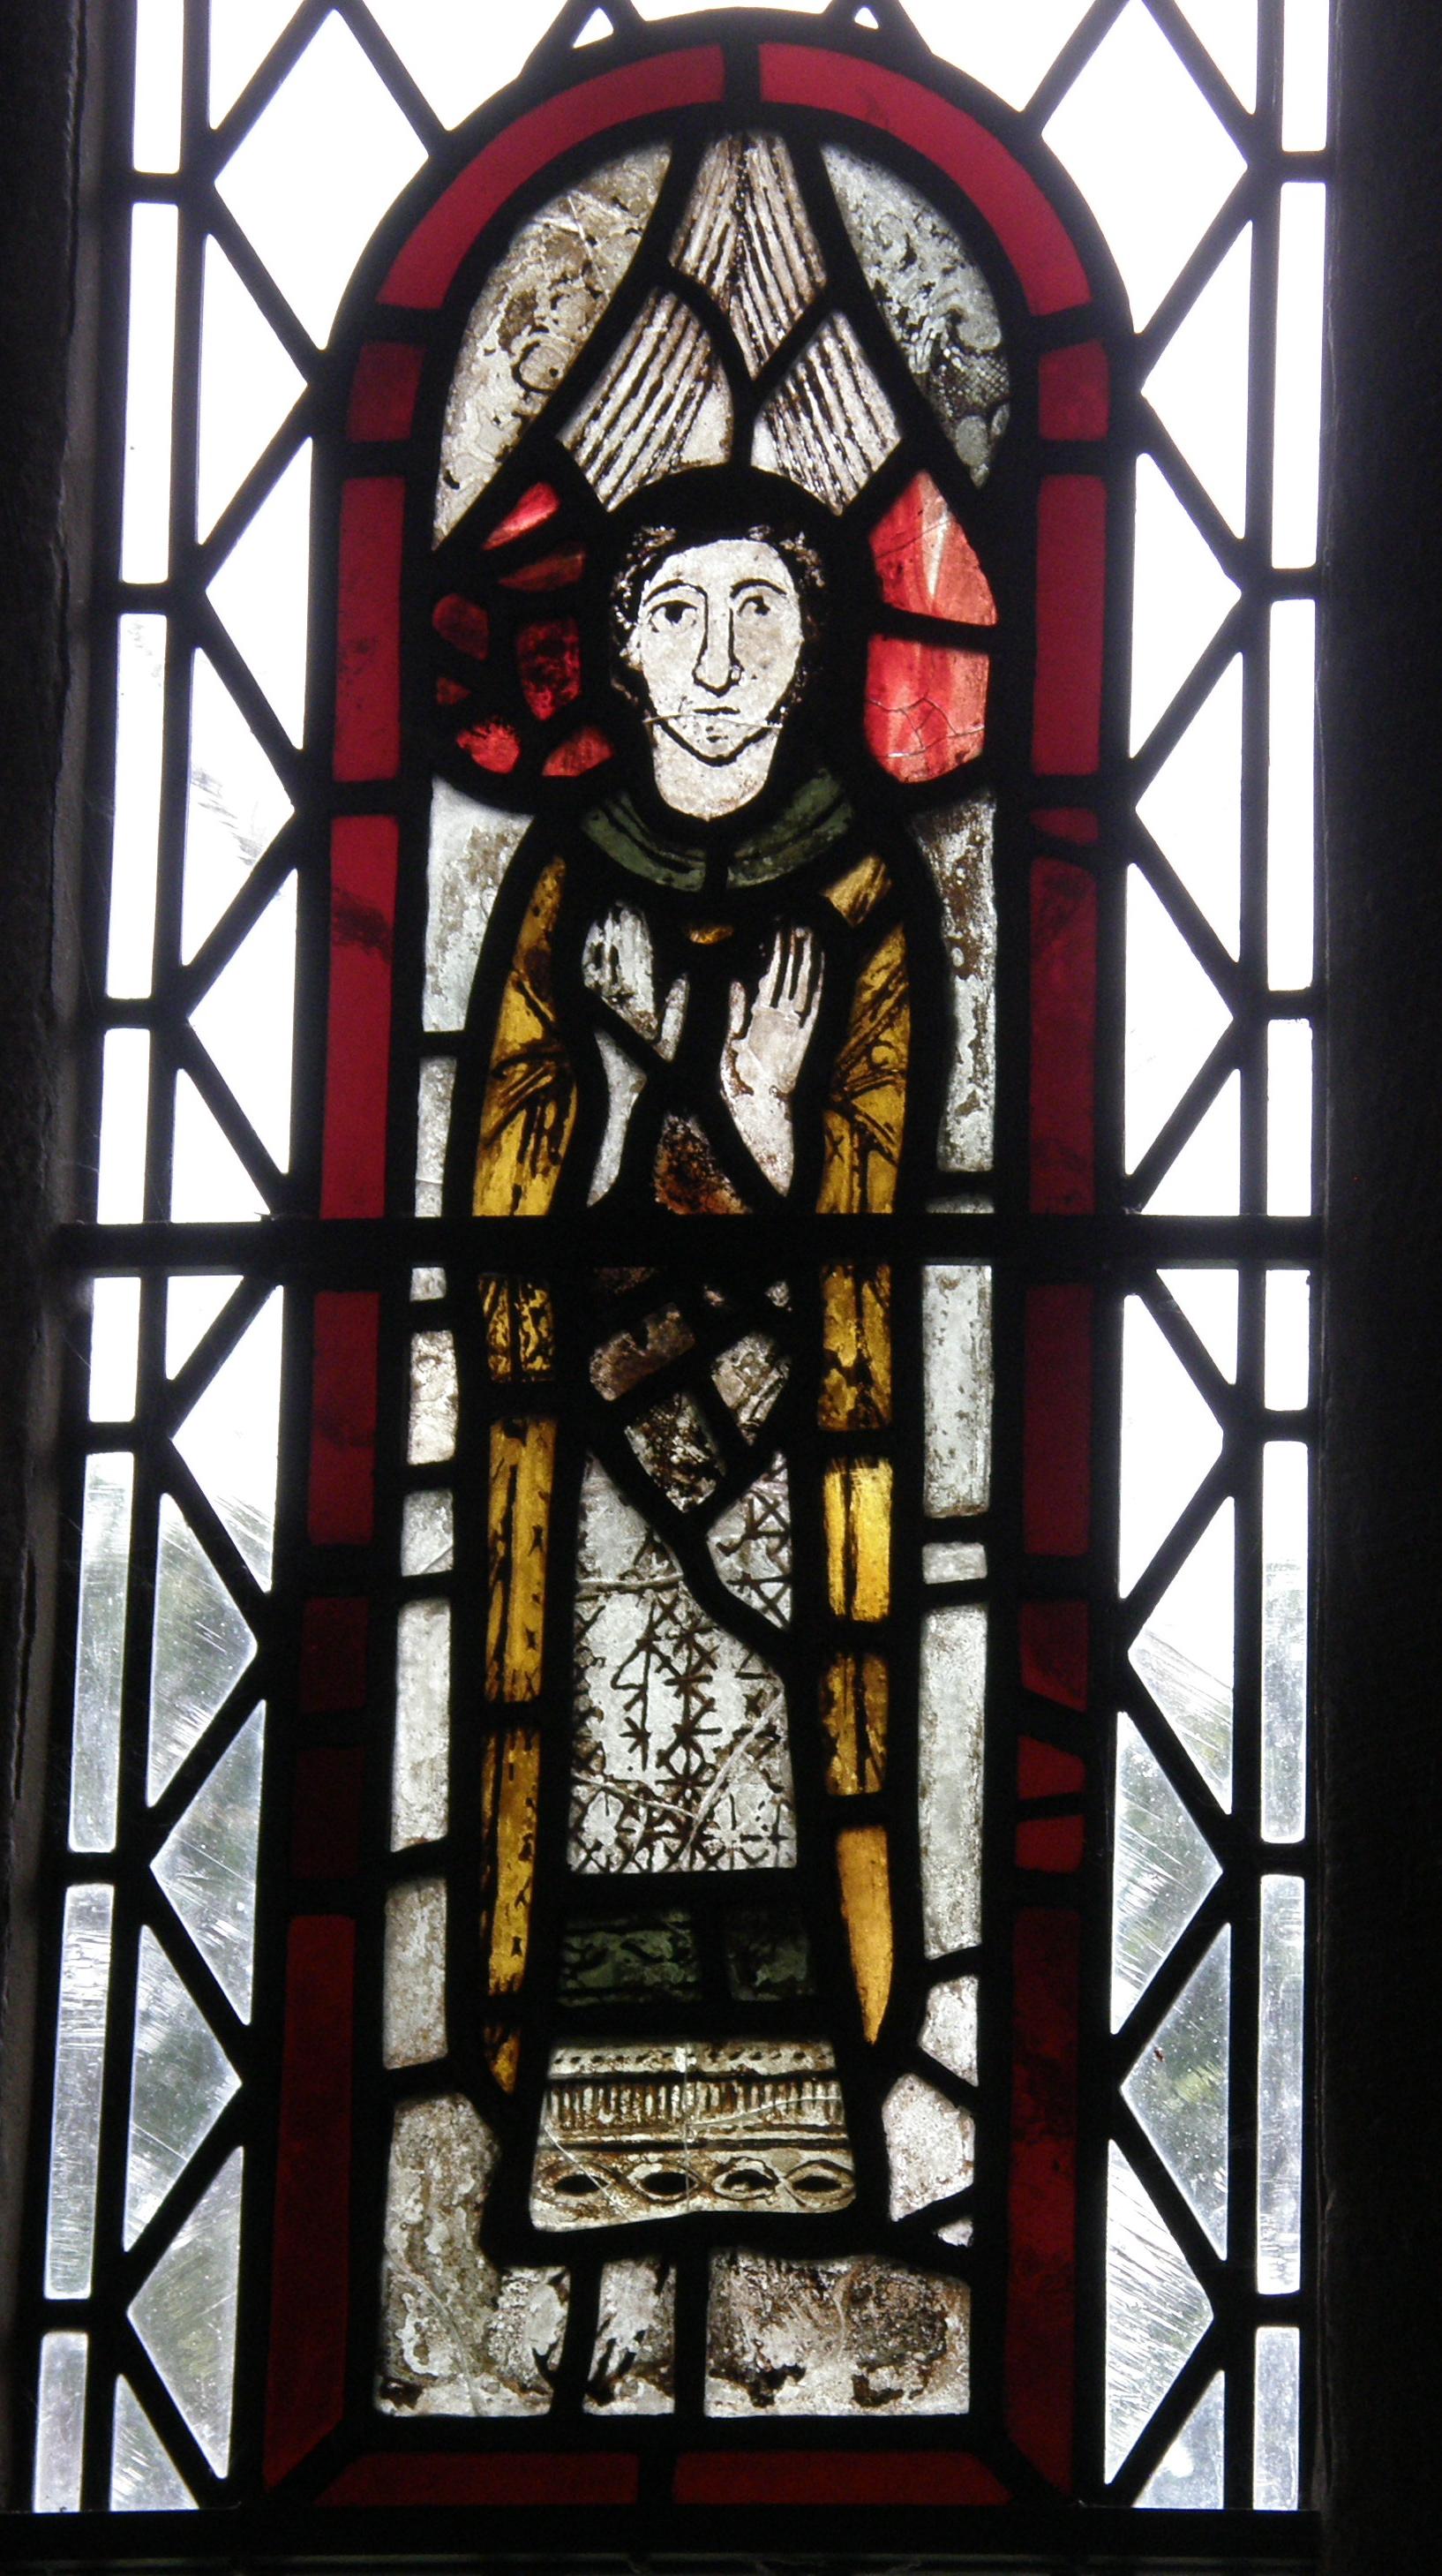 St. Michael Window, All Saints, Dalbury, Derbyshire, UK